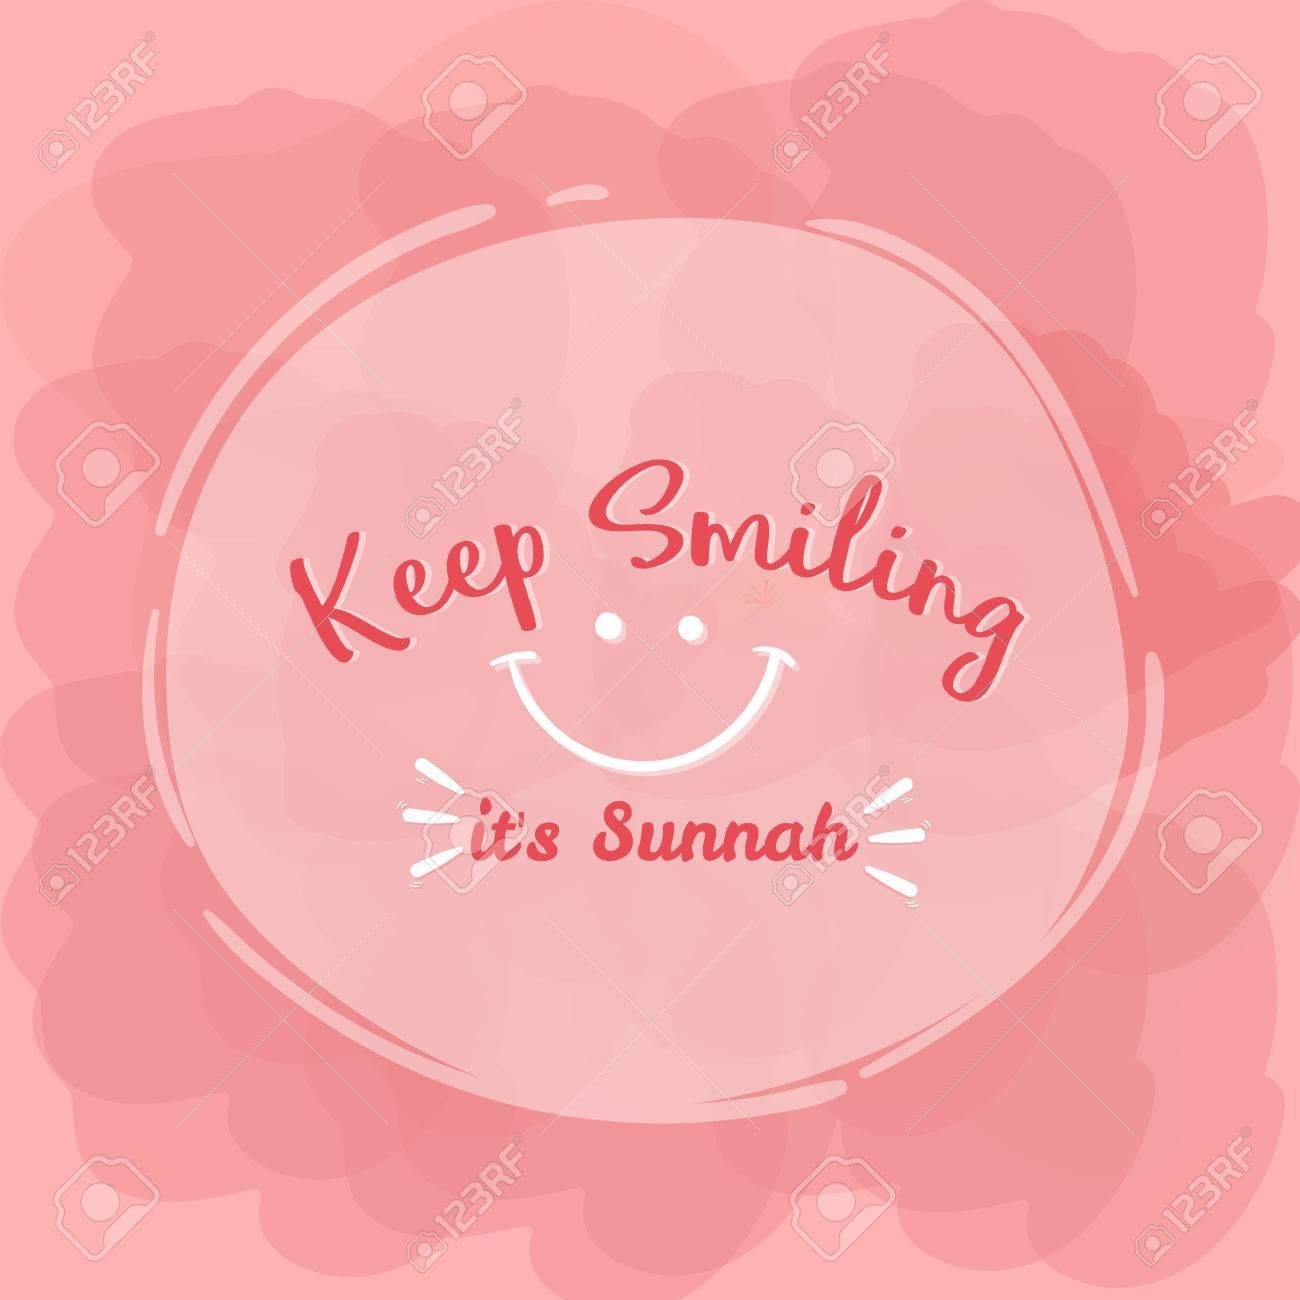 keep smiling its sunnah quotes islam word royalty cliparts